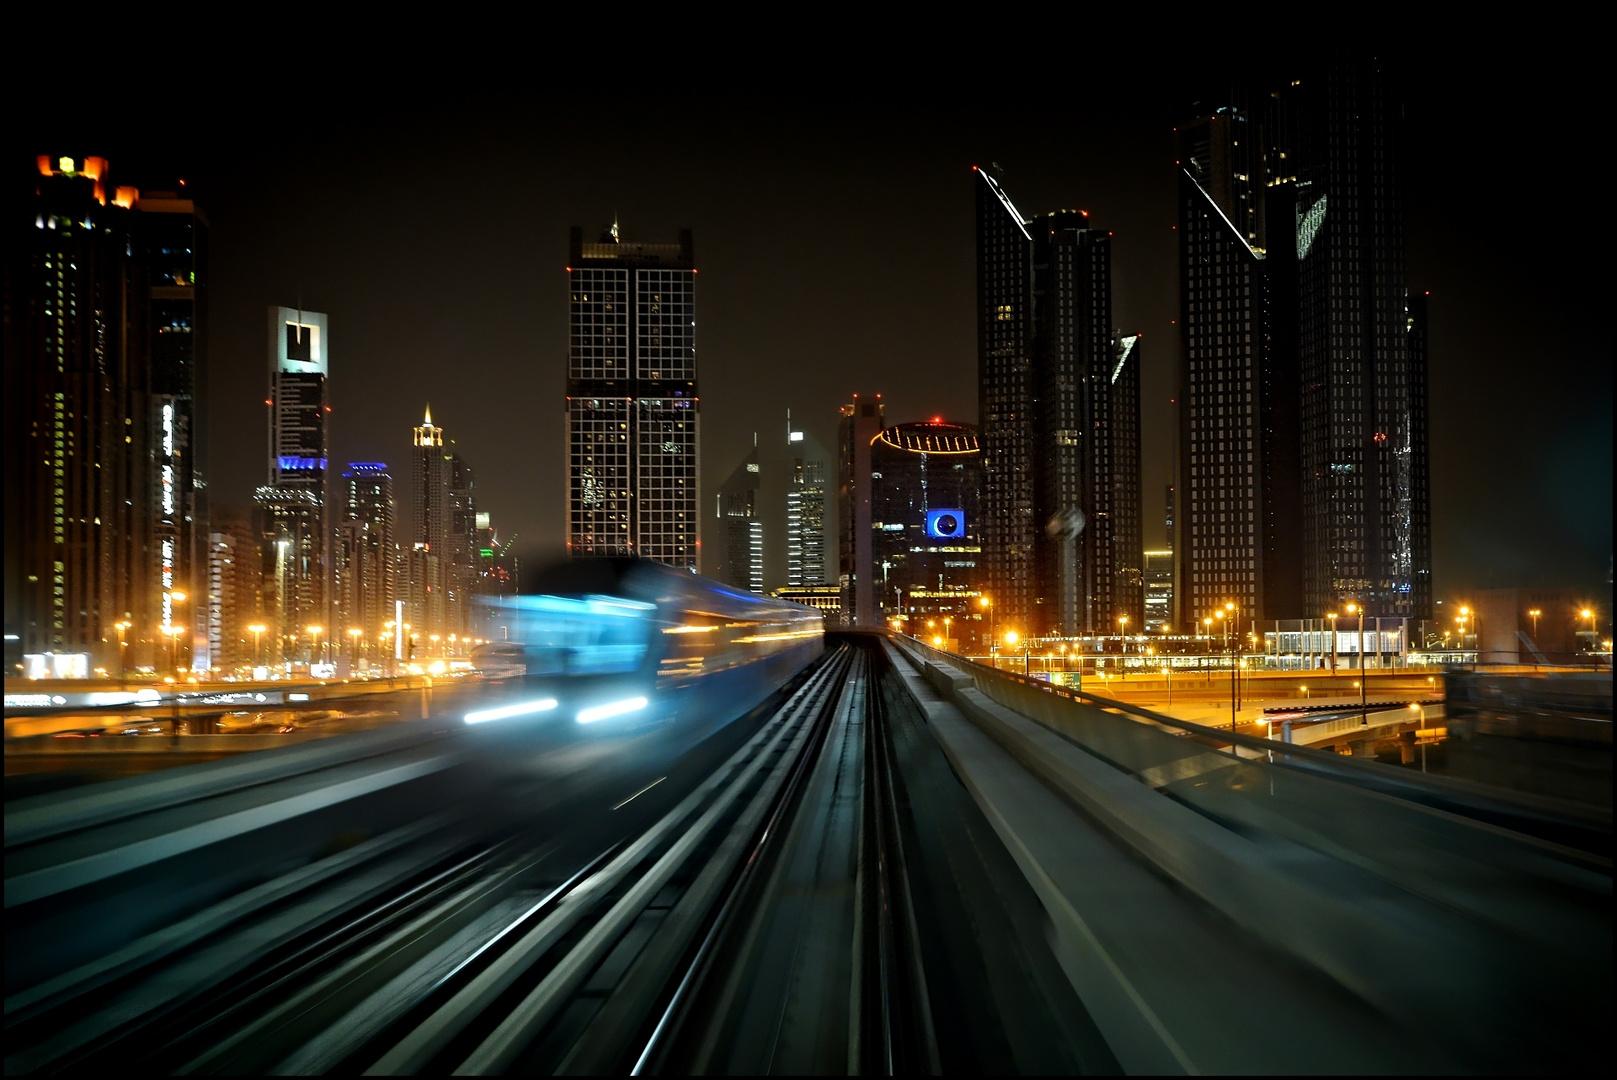 Kreuzen der Dubai Metro